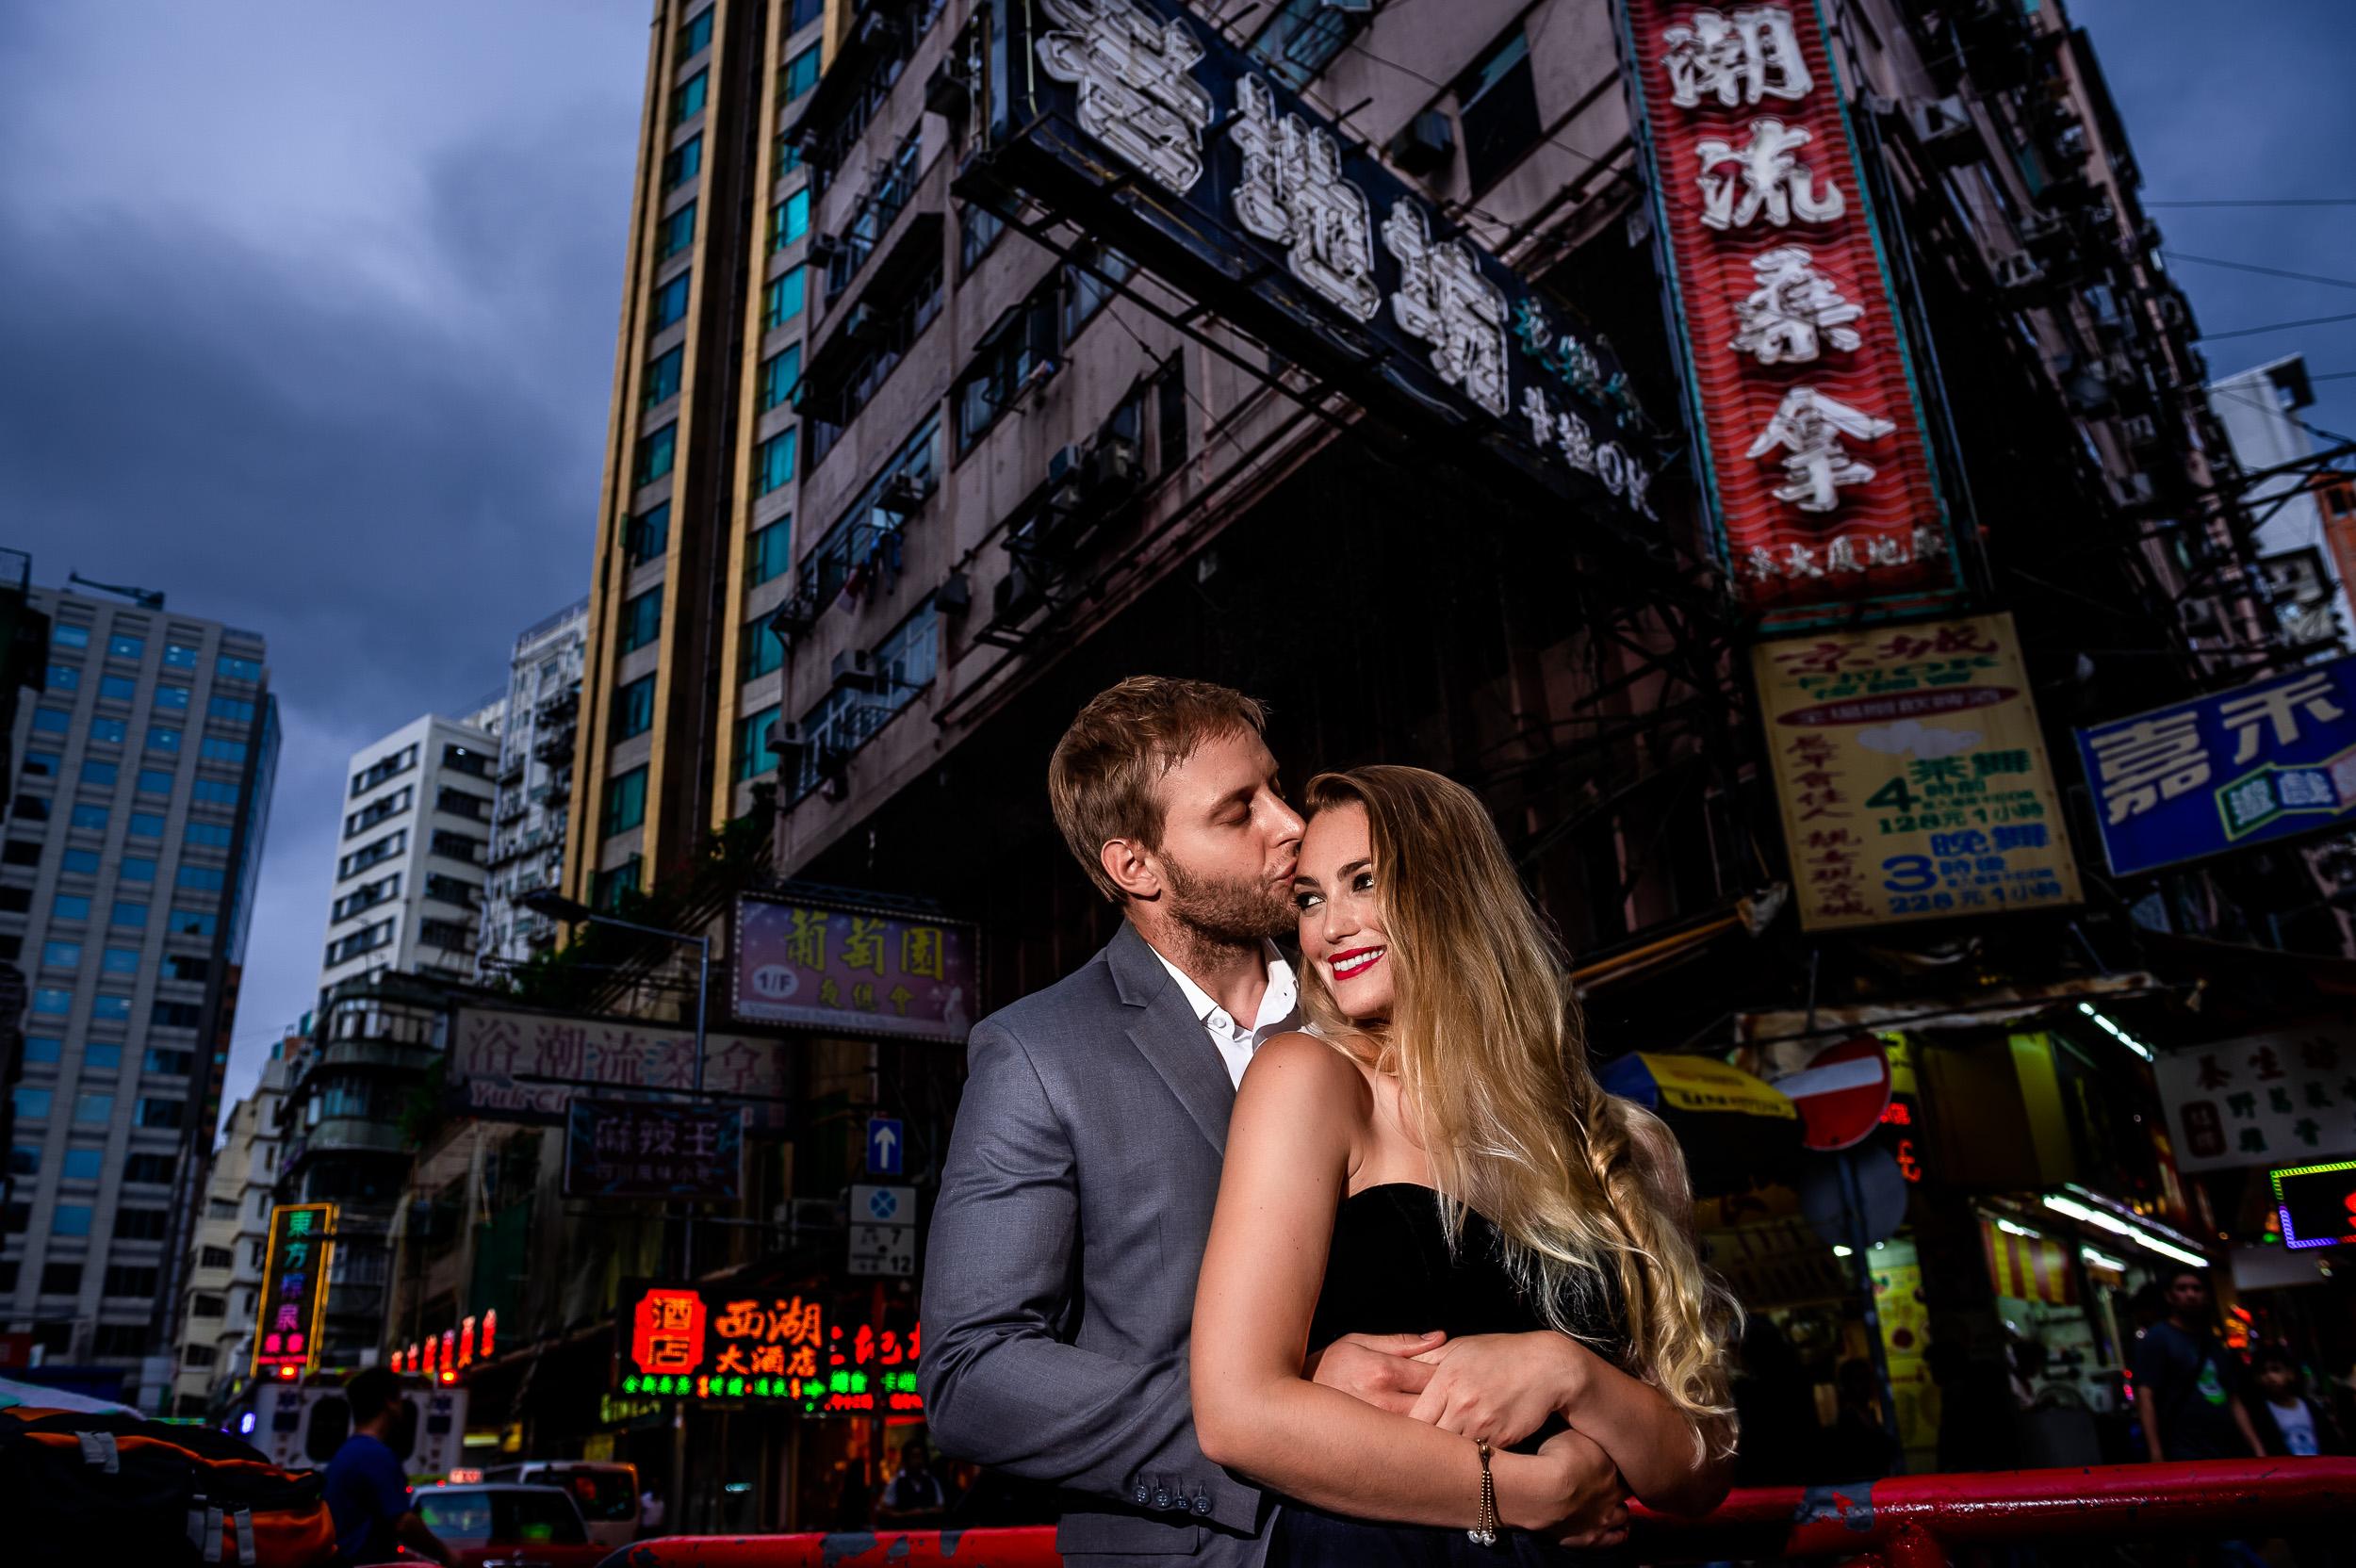 Michelle + Mike  Kowloon, Hong Kong